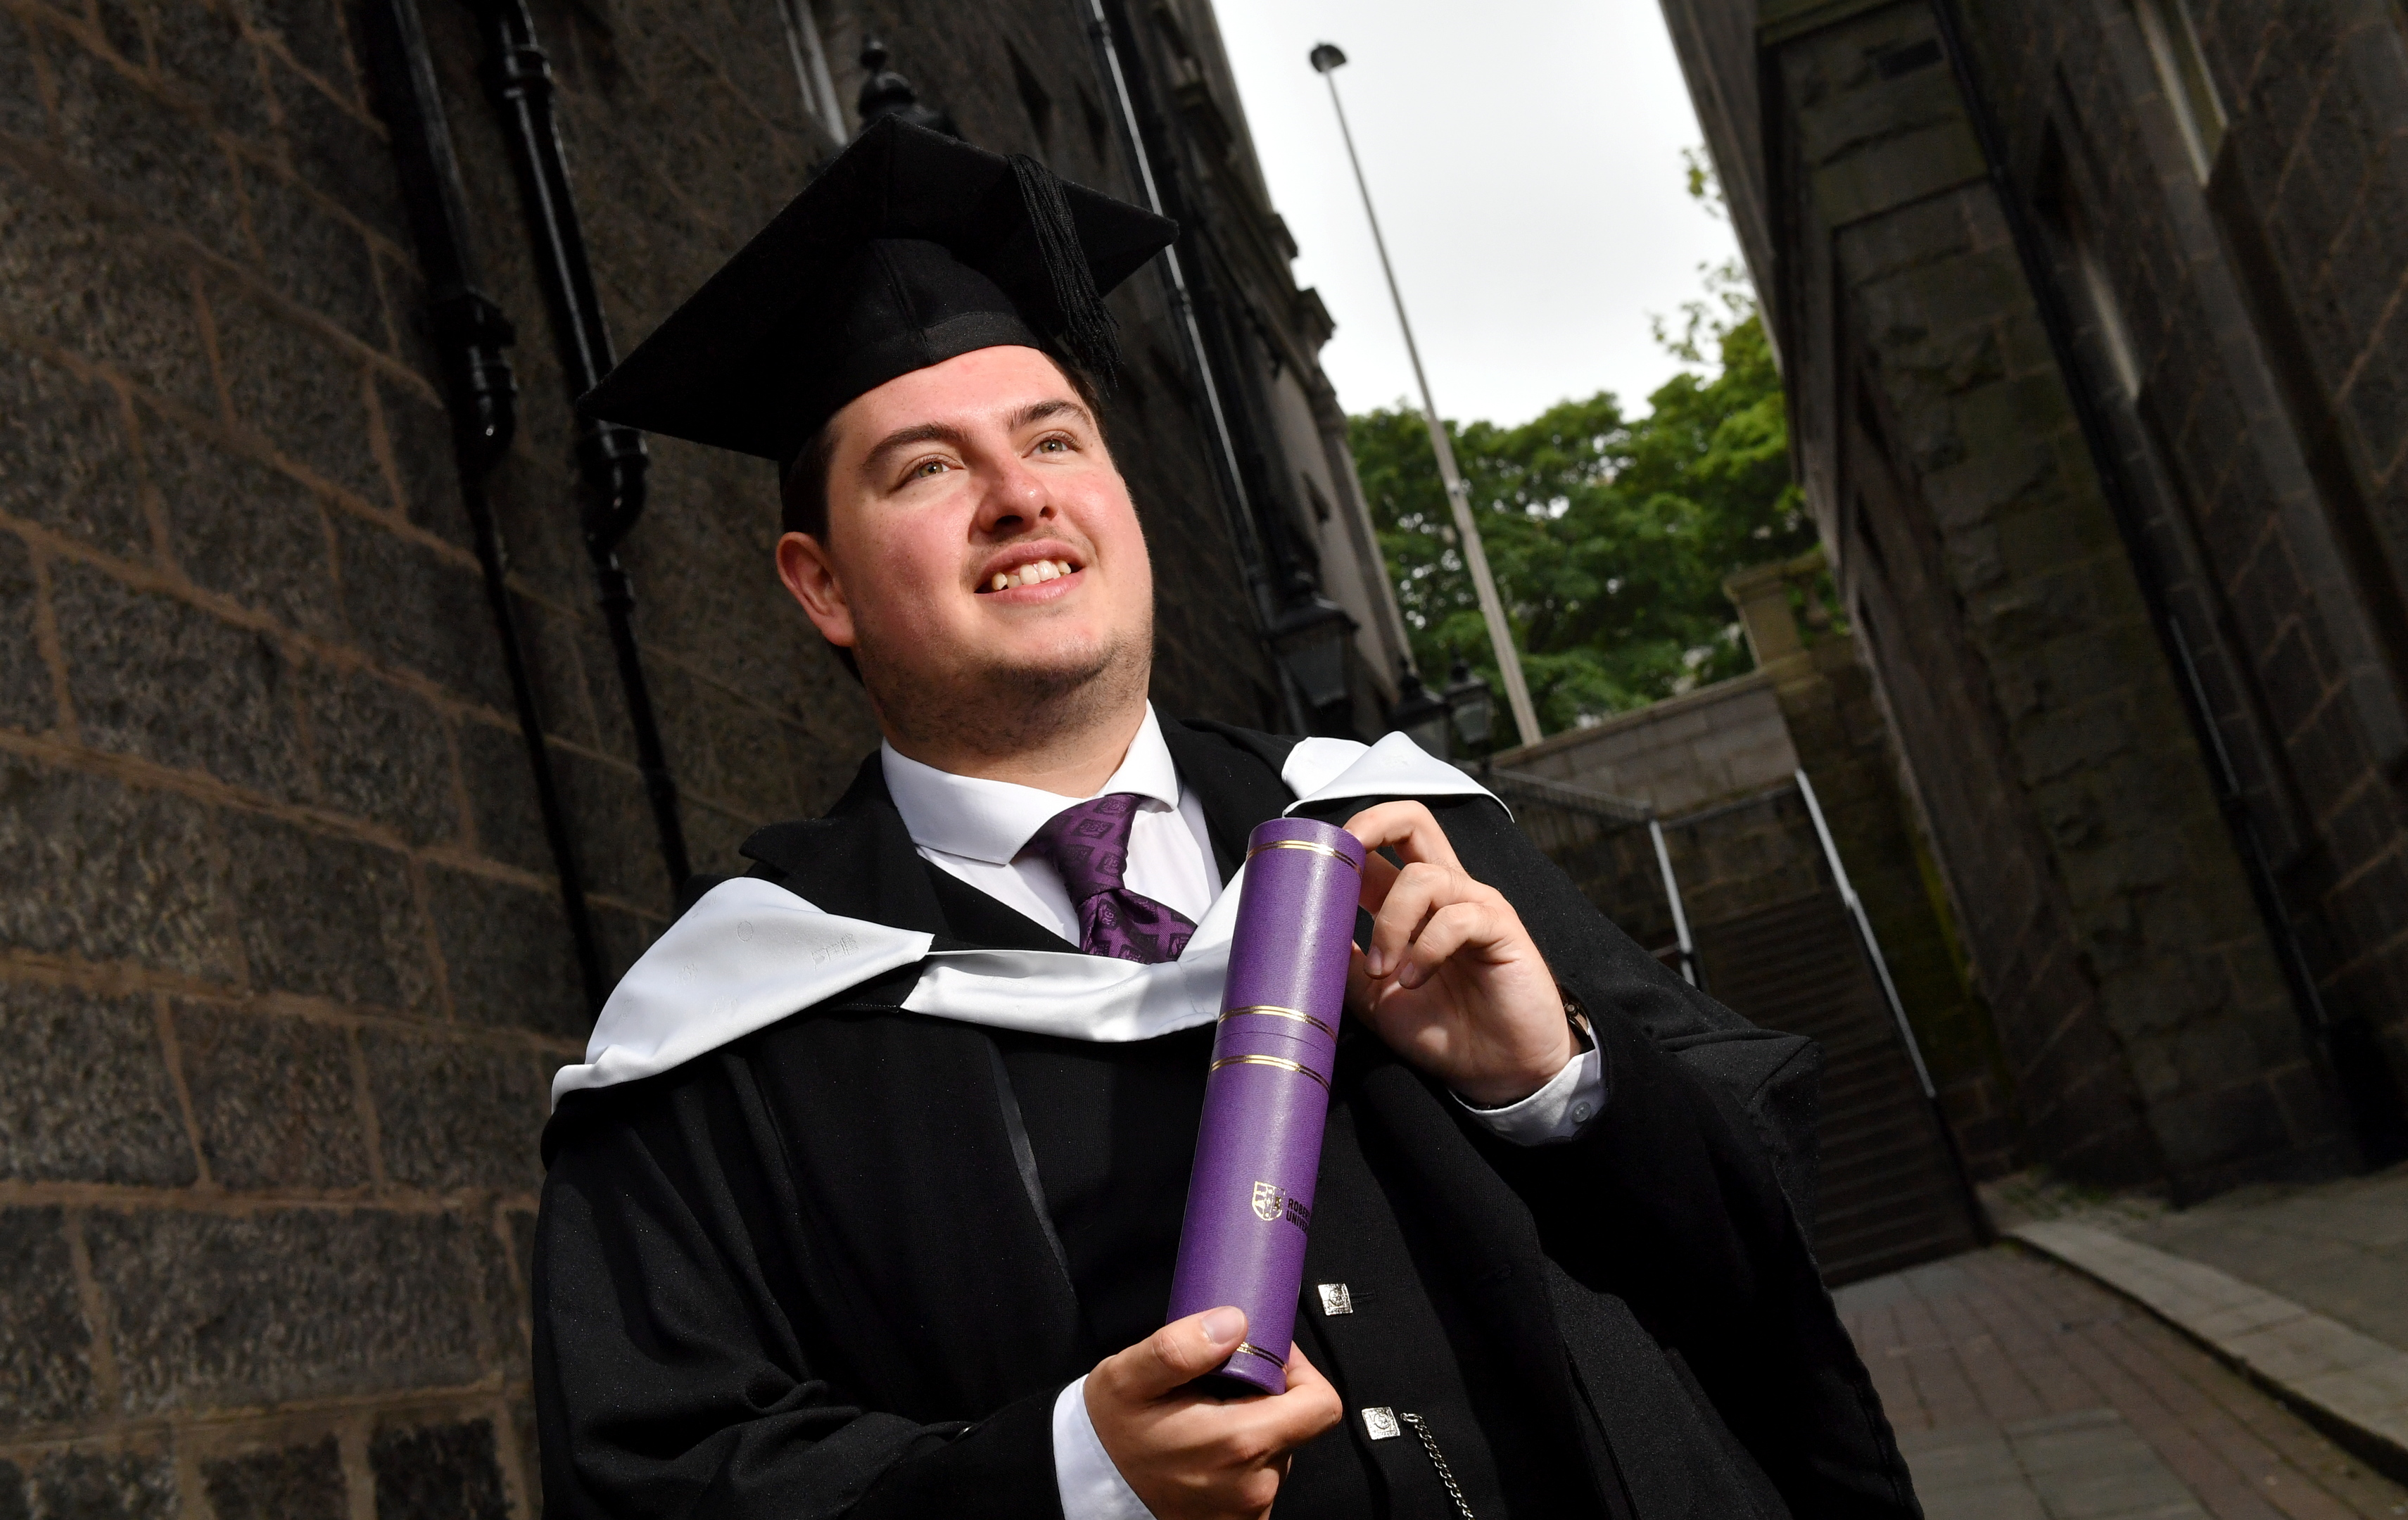 Edward Pollock graduated from RGU yesterday